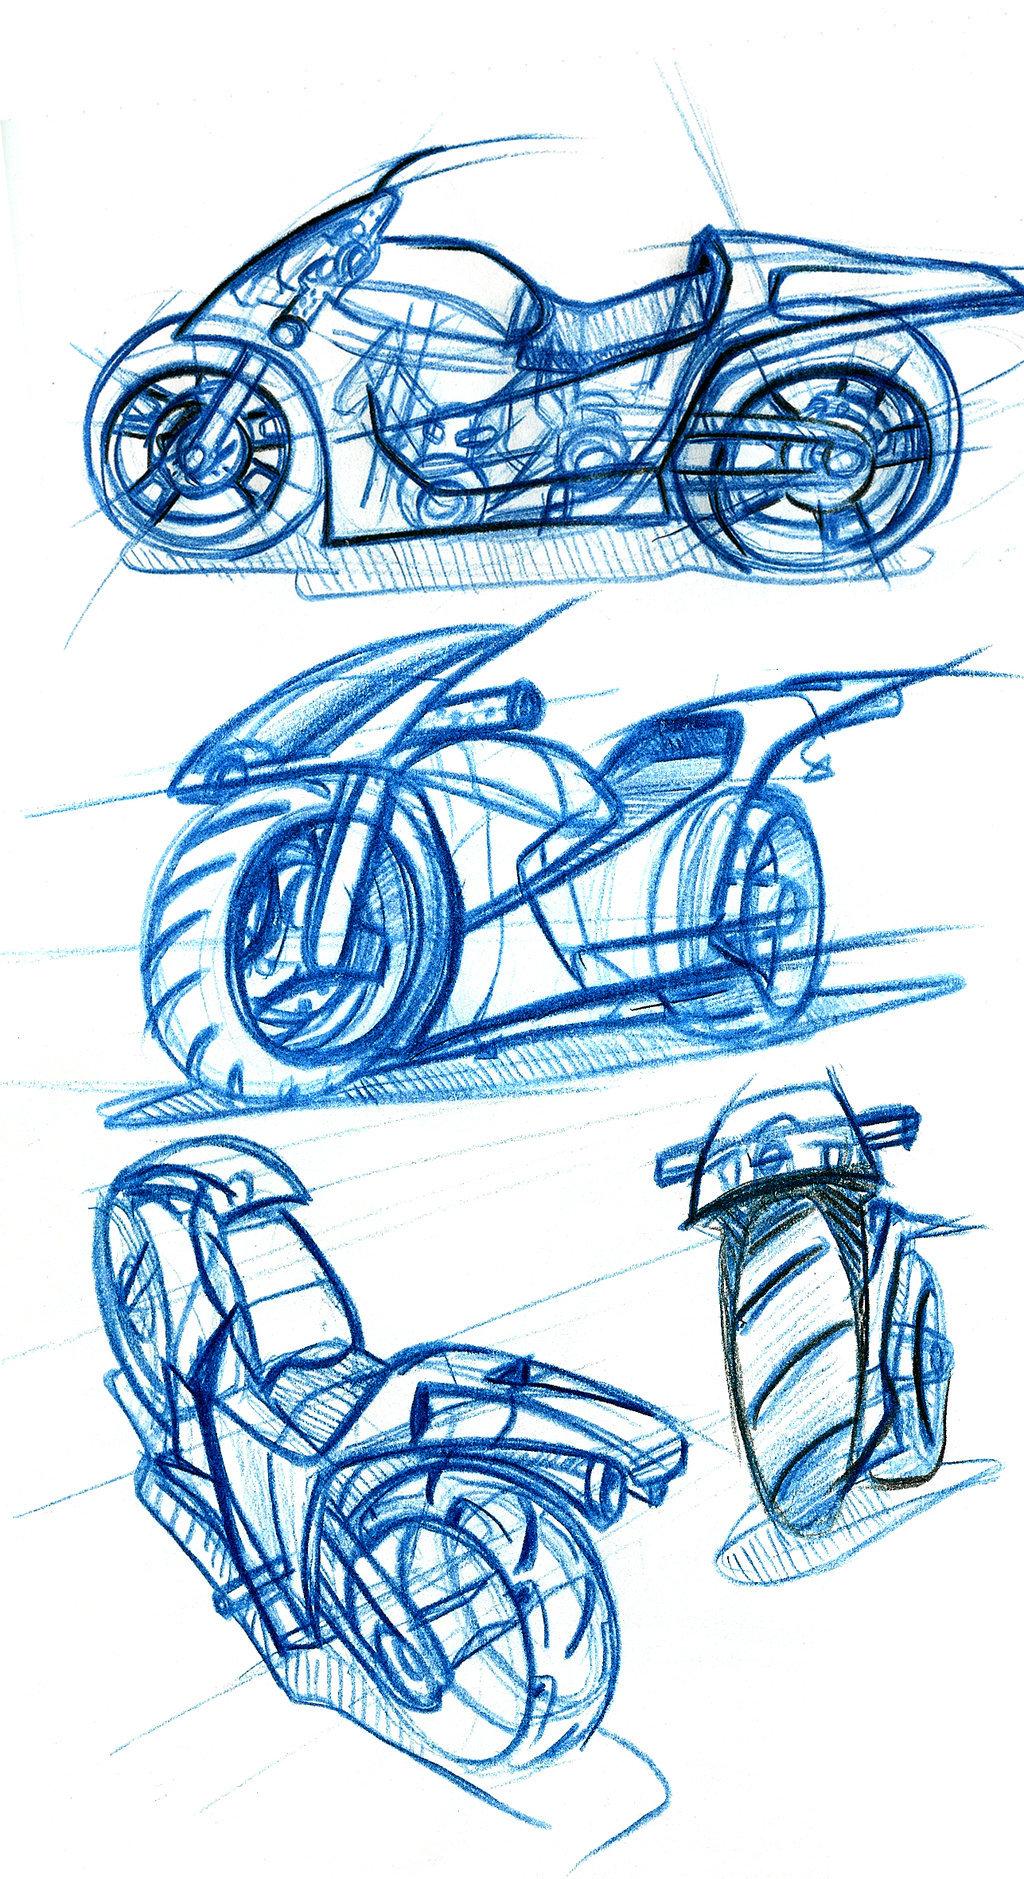 1024x1879 Crotch Rocket Sketches By Juggleboy711